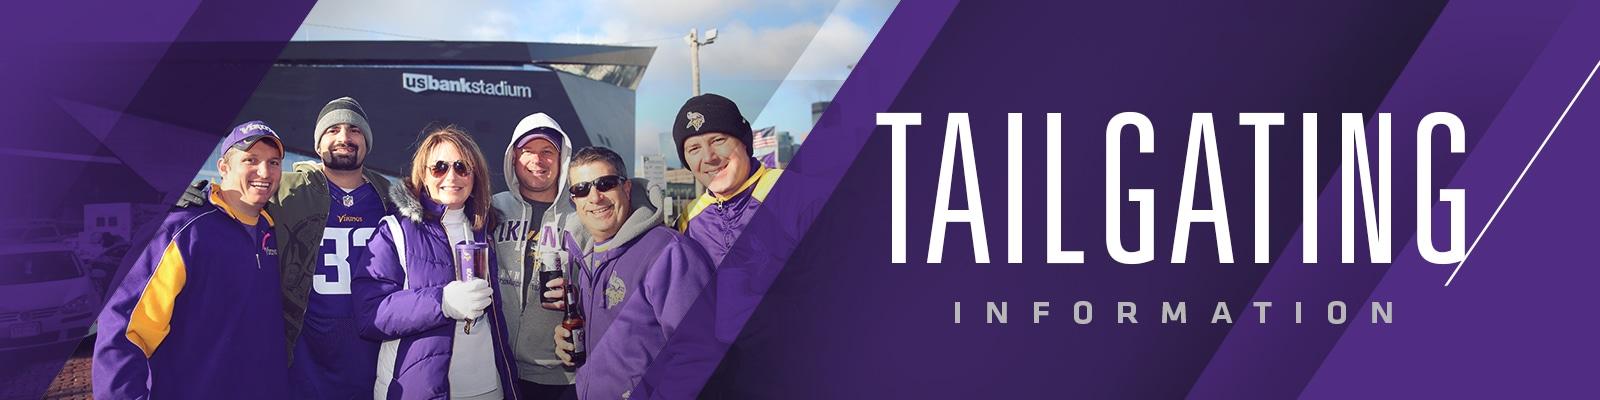 Vikings Tailgating U S  Bank Stadium | Minnesota Vikings